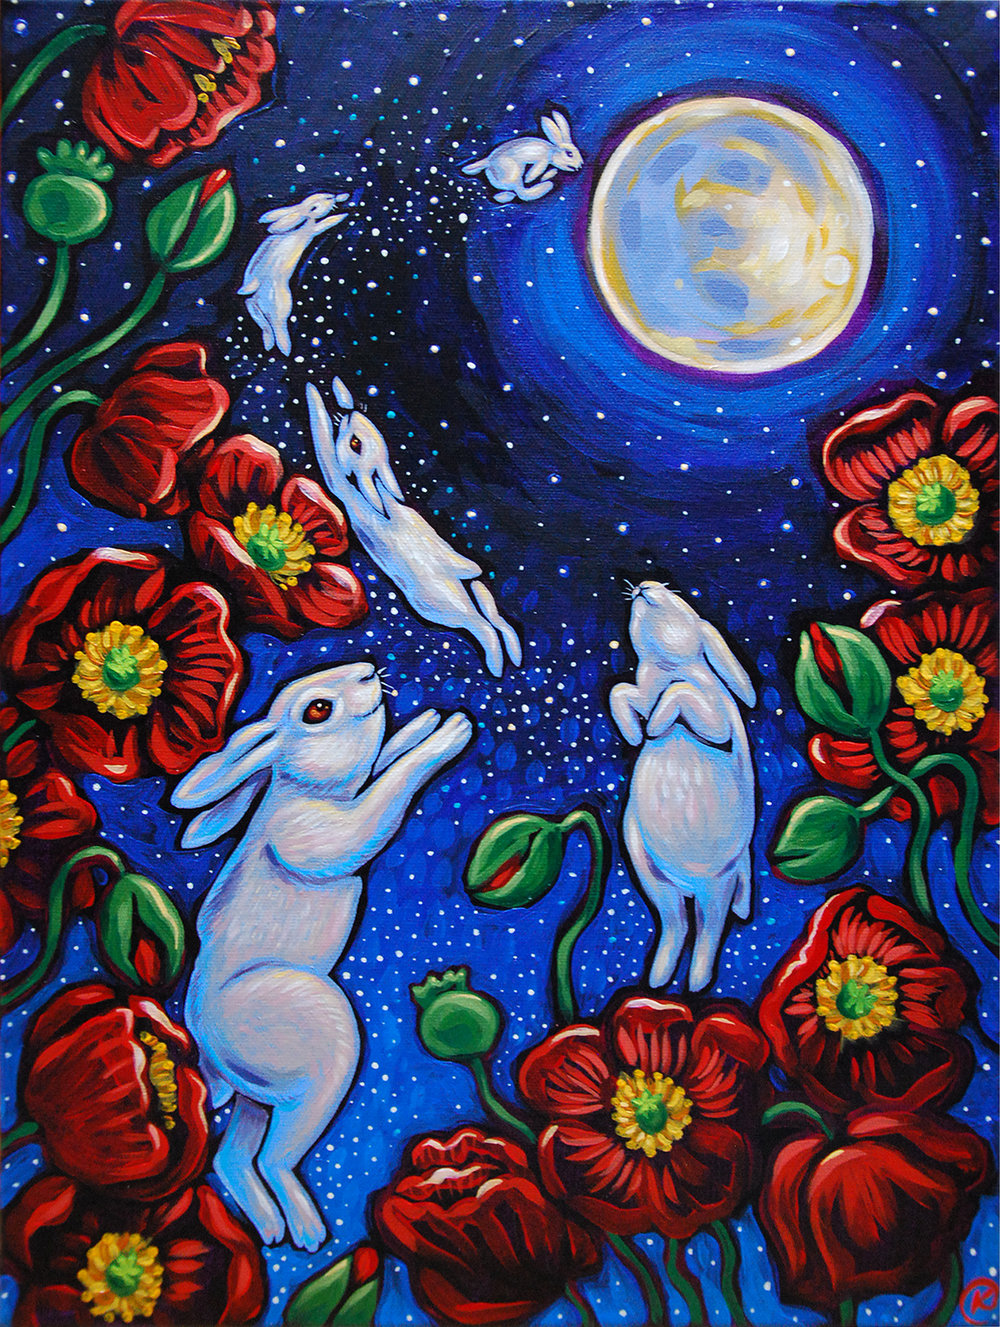 White Rabbits Return to the Moon 2019